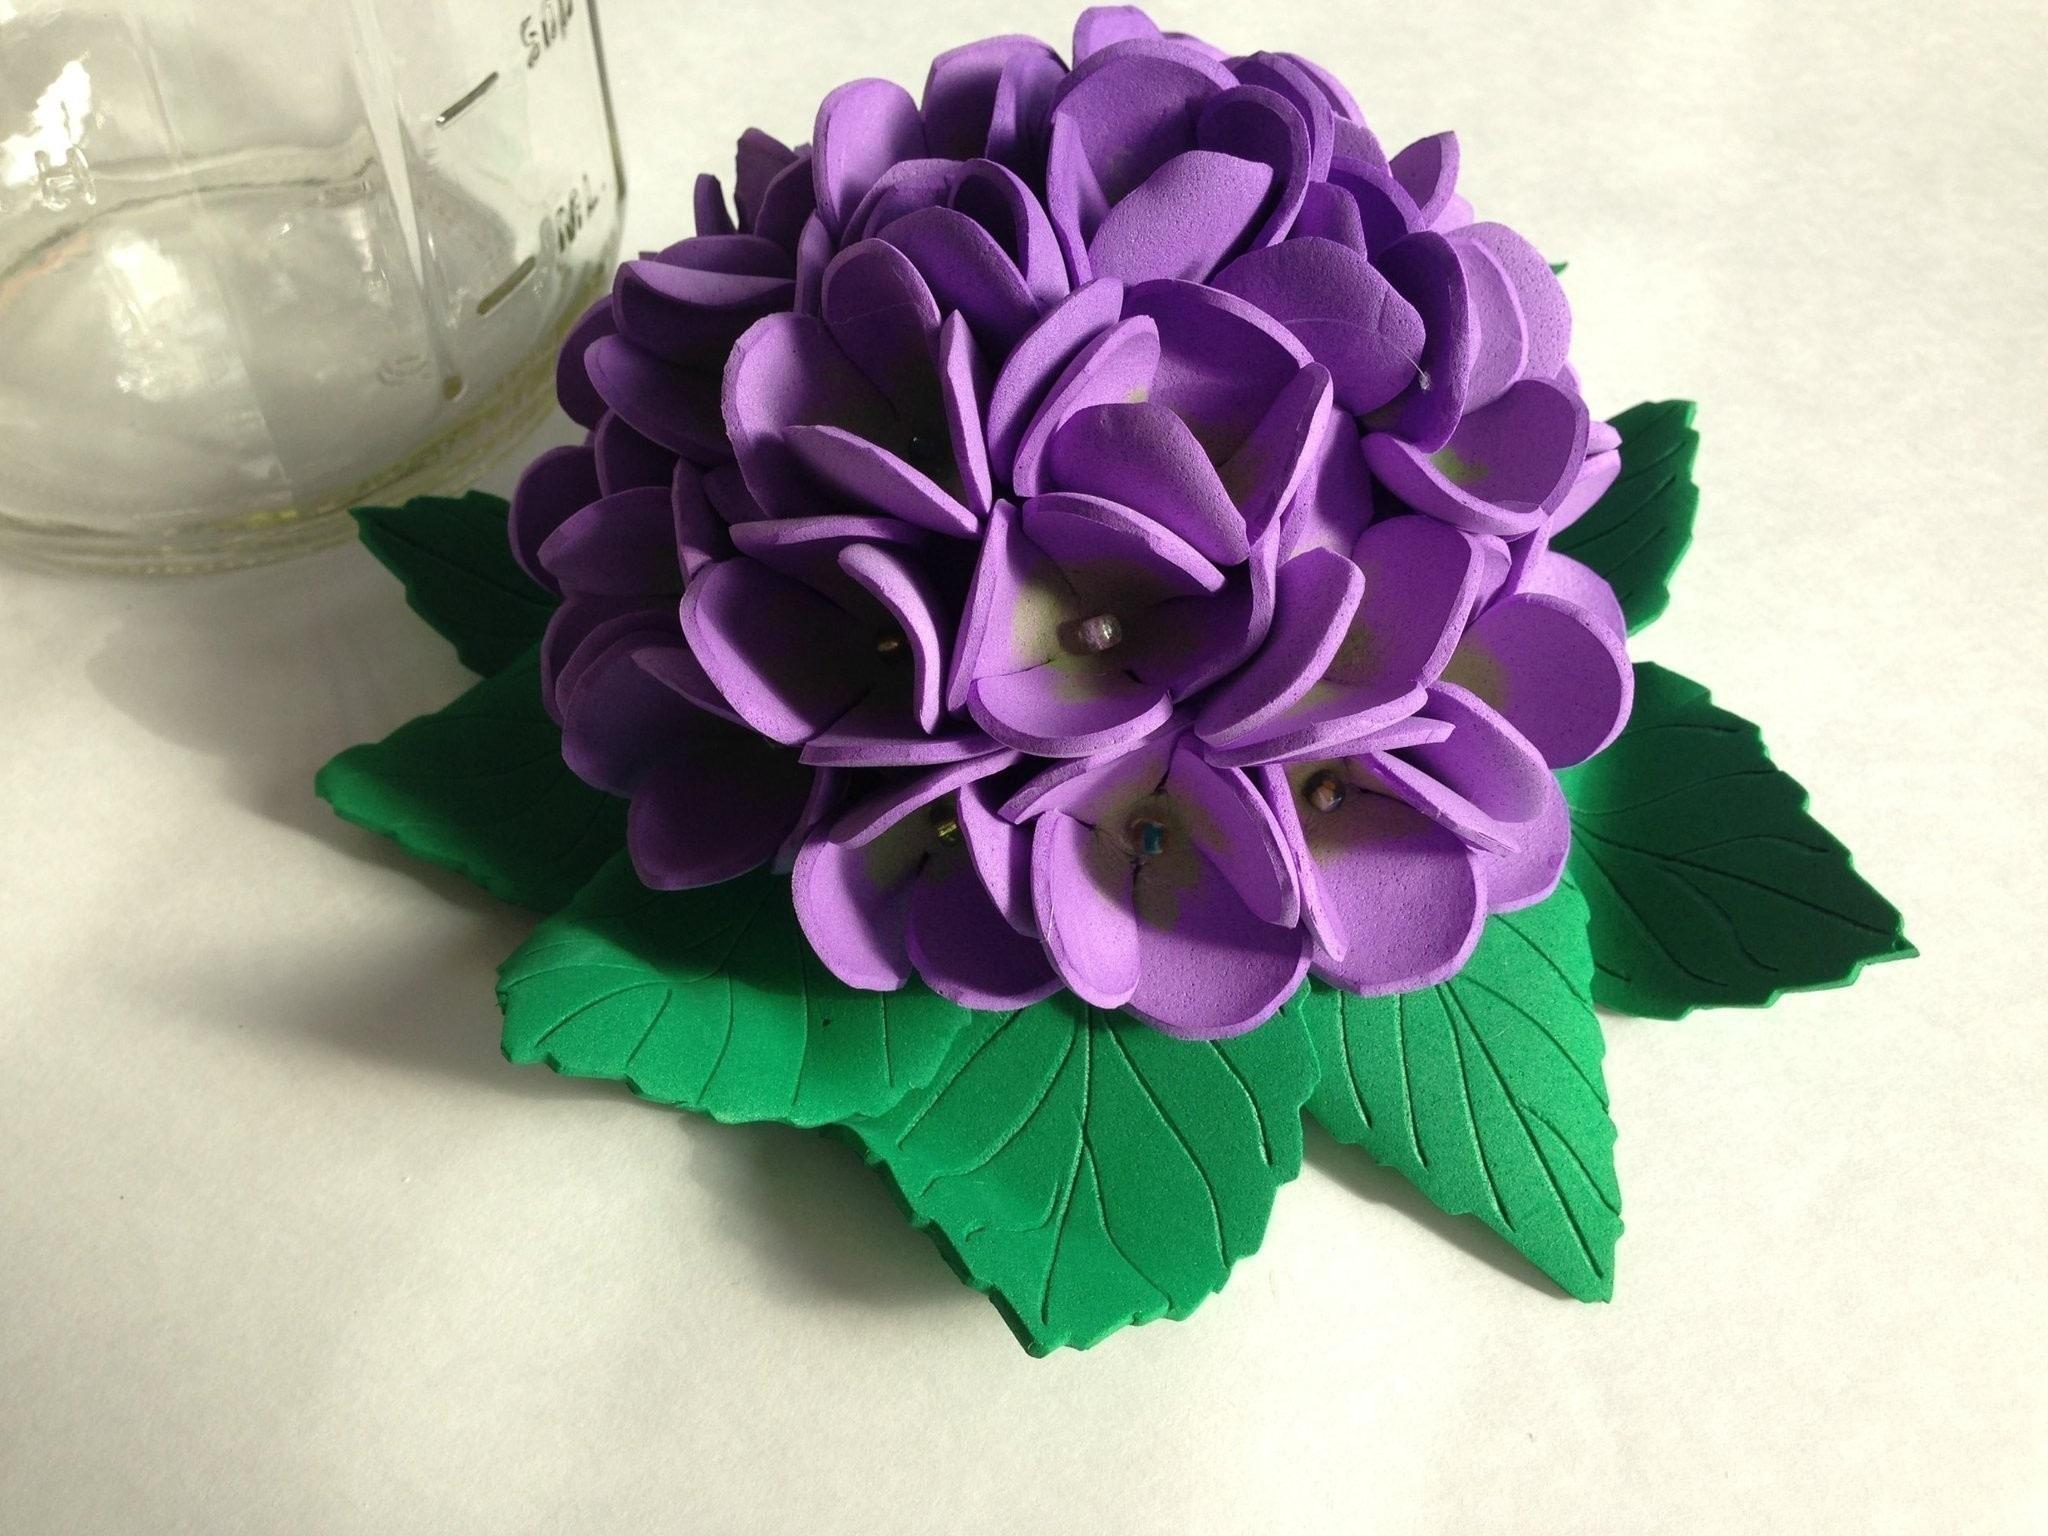 Mason jar foam flowers decorative tops how to make a flowers rosettes other on cut out keep - Flores sencillas de goma eva ...